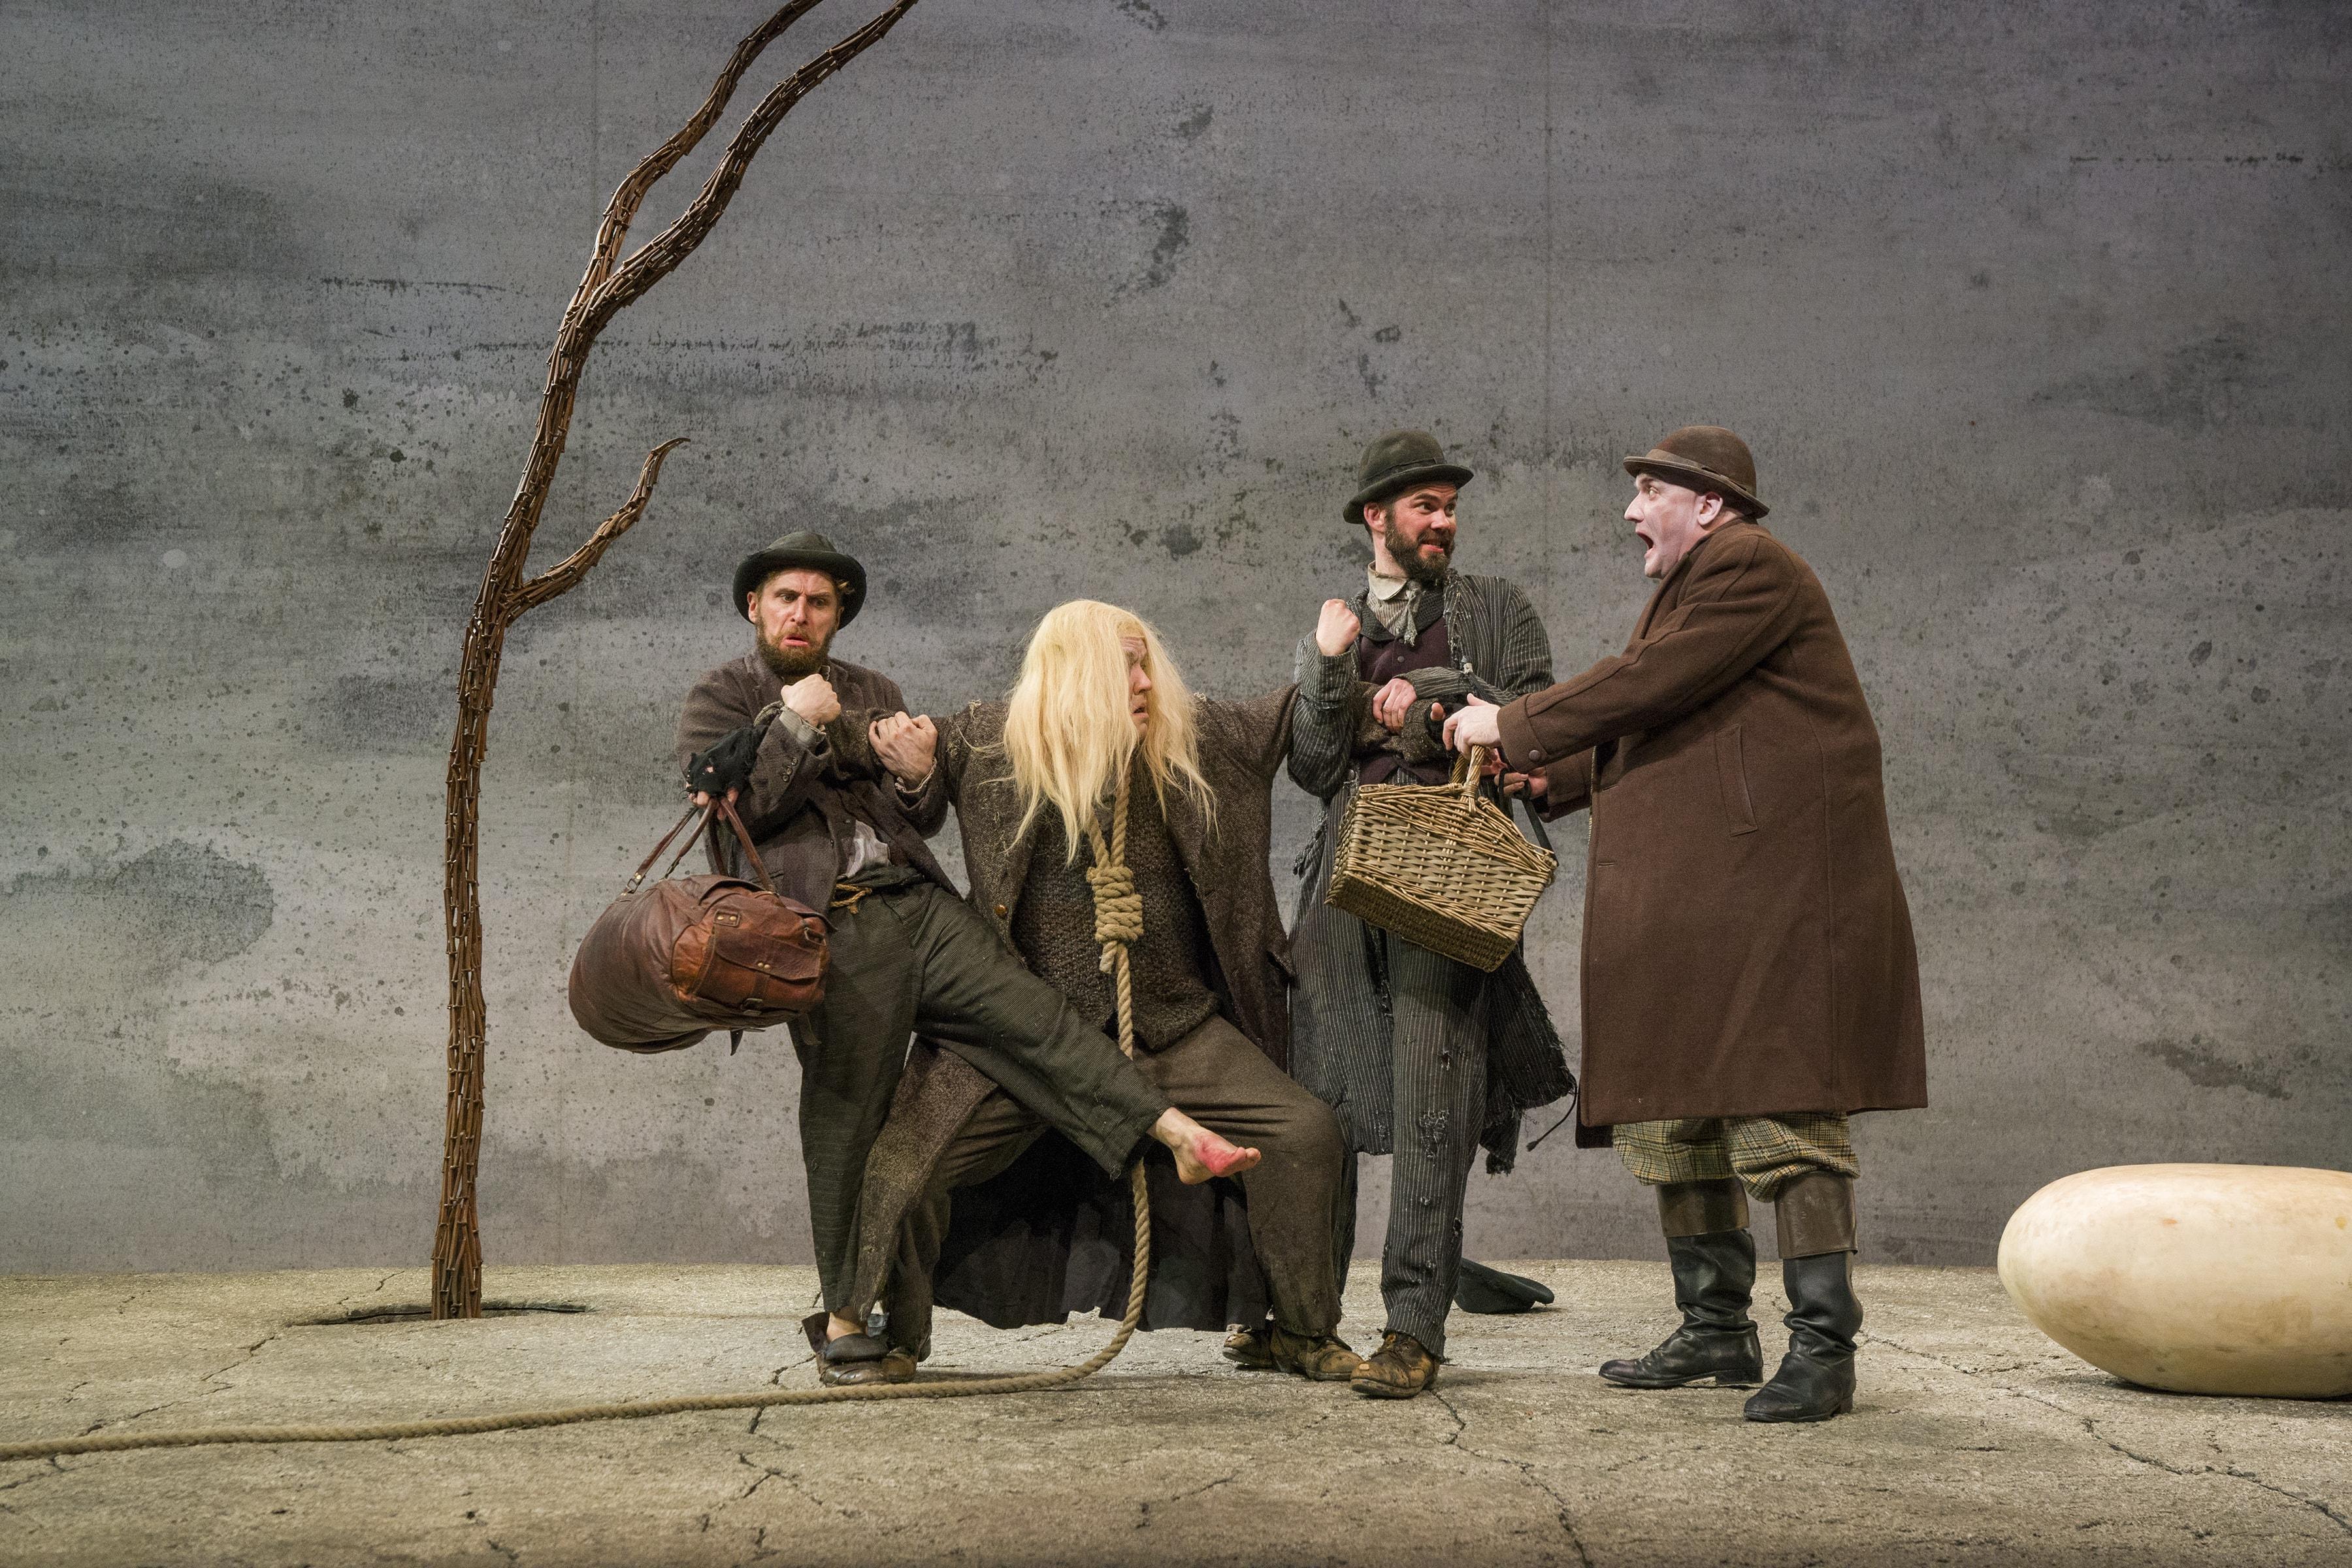 Aaron Monaghan, Garrett Lombard, Marty Rea, and Rory Nolan. Photo by Richard Termine.